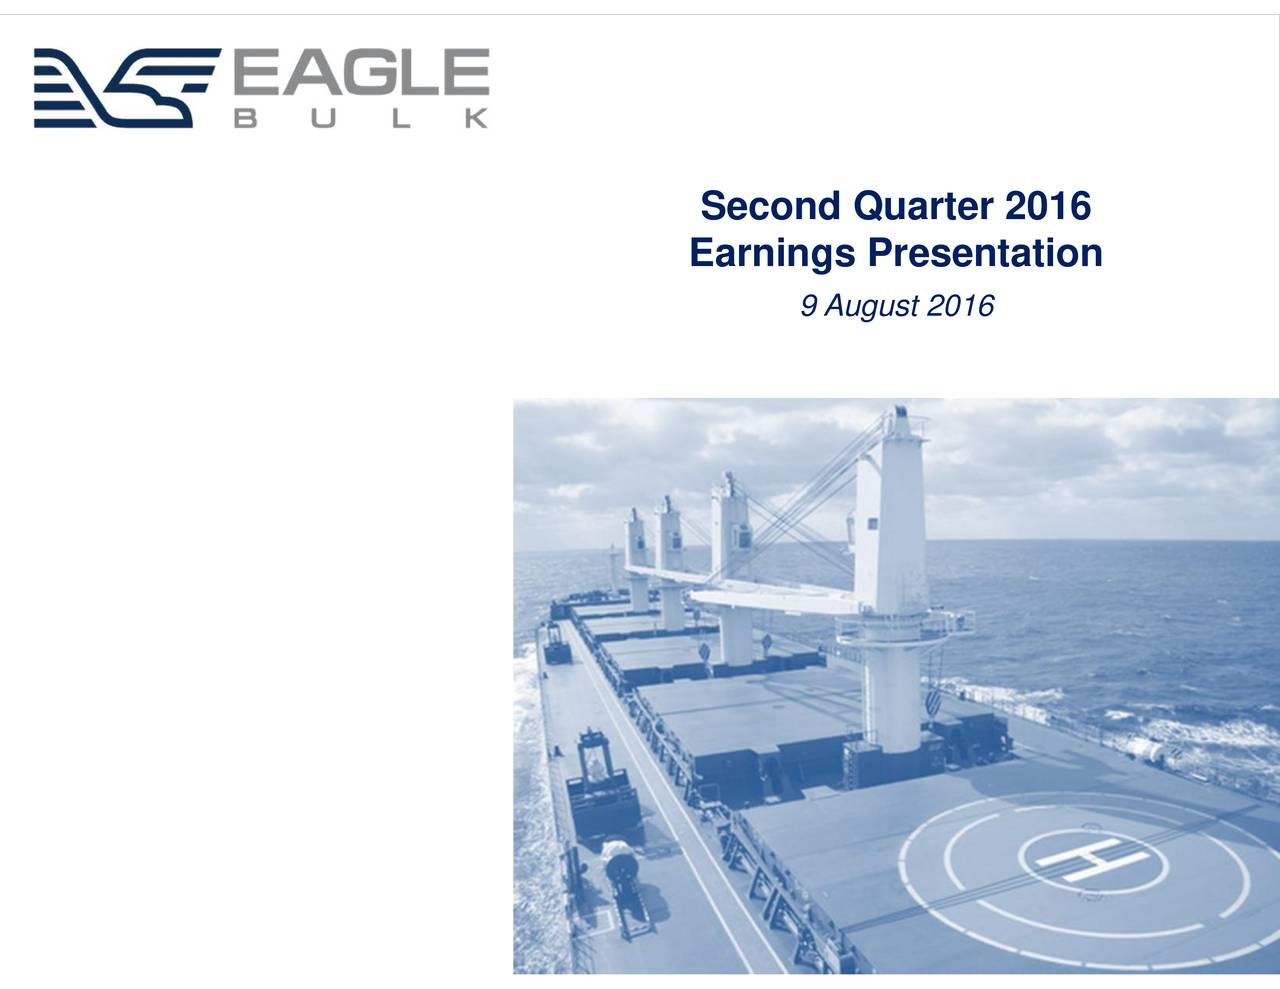 Earnings Presentation 9 August 2016 EGLE